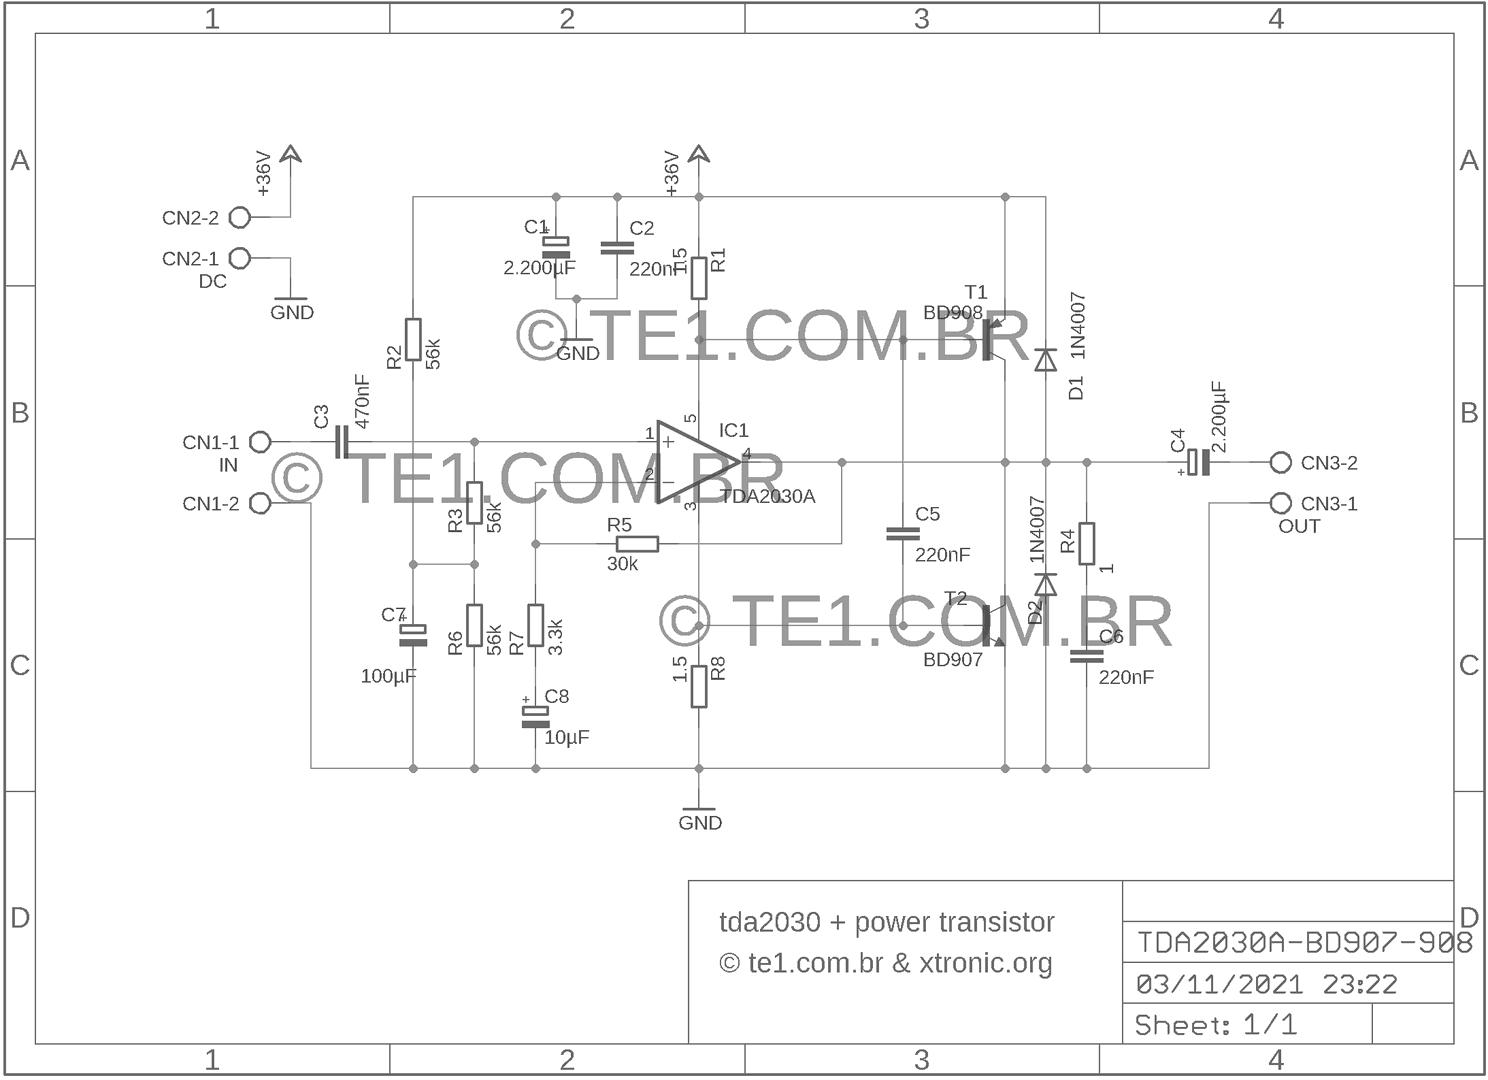 Amplificador De Potncia Com Tda2030 Transistores 20w Power Amplifier Circuit Based Tda2040 Audio 40 Watt Transistor Esquem 700x508 Tip41 E Tip42